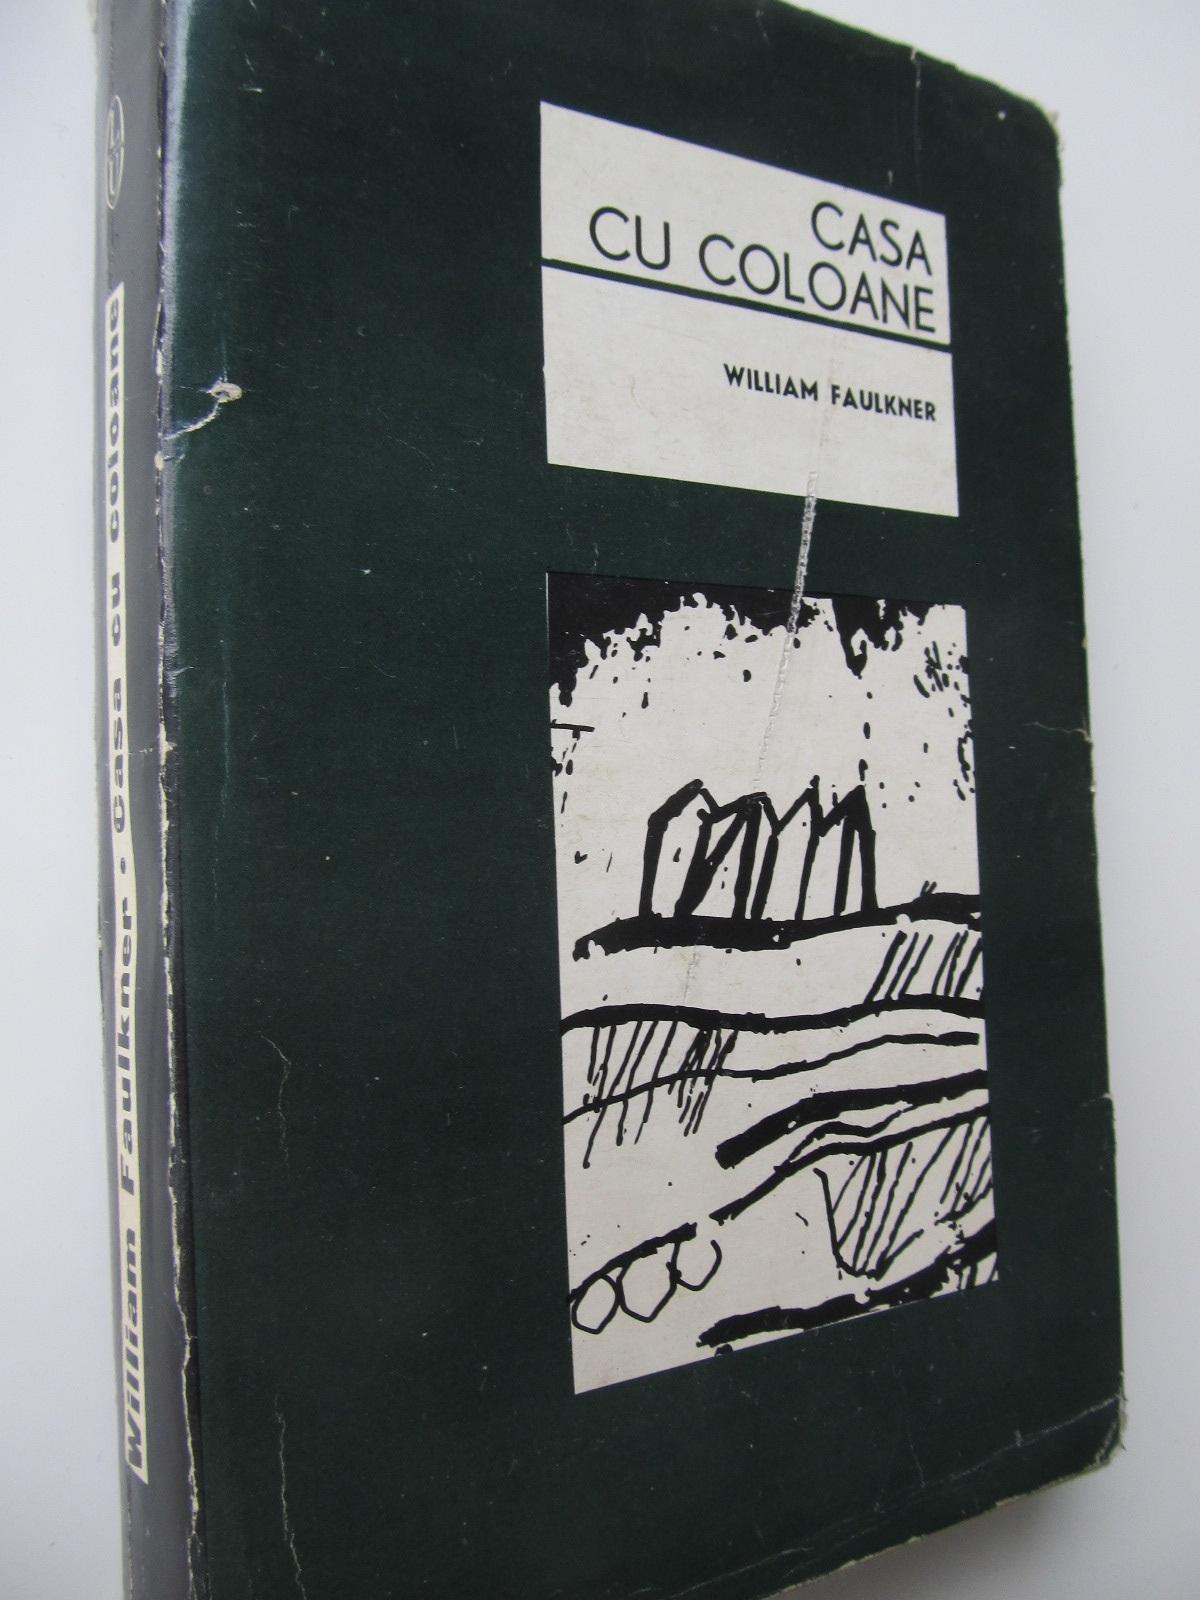 Carte Casa cu coloane - William Faulkner